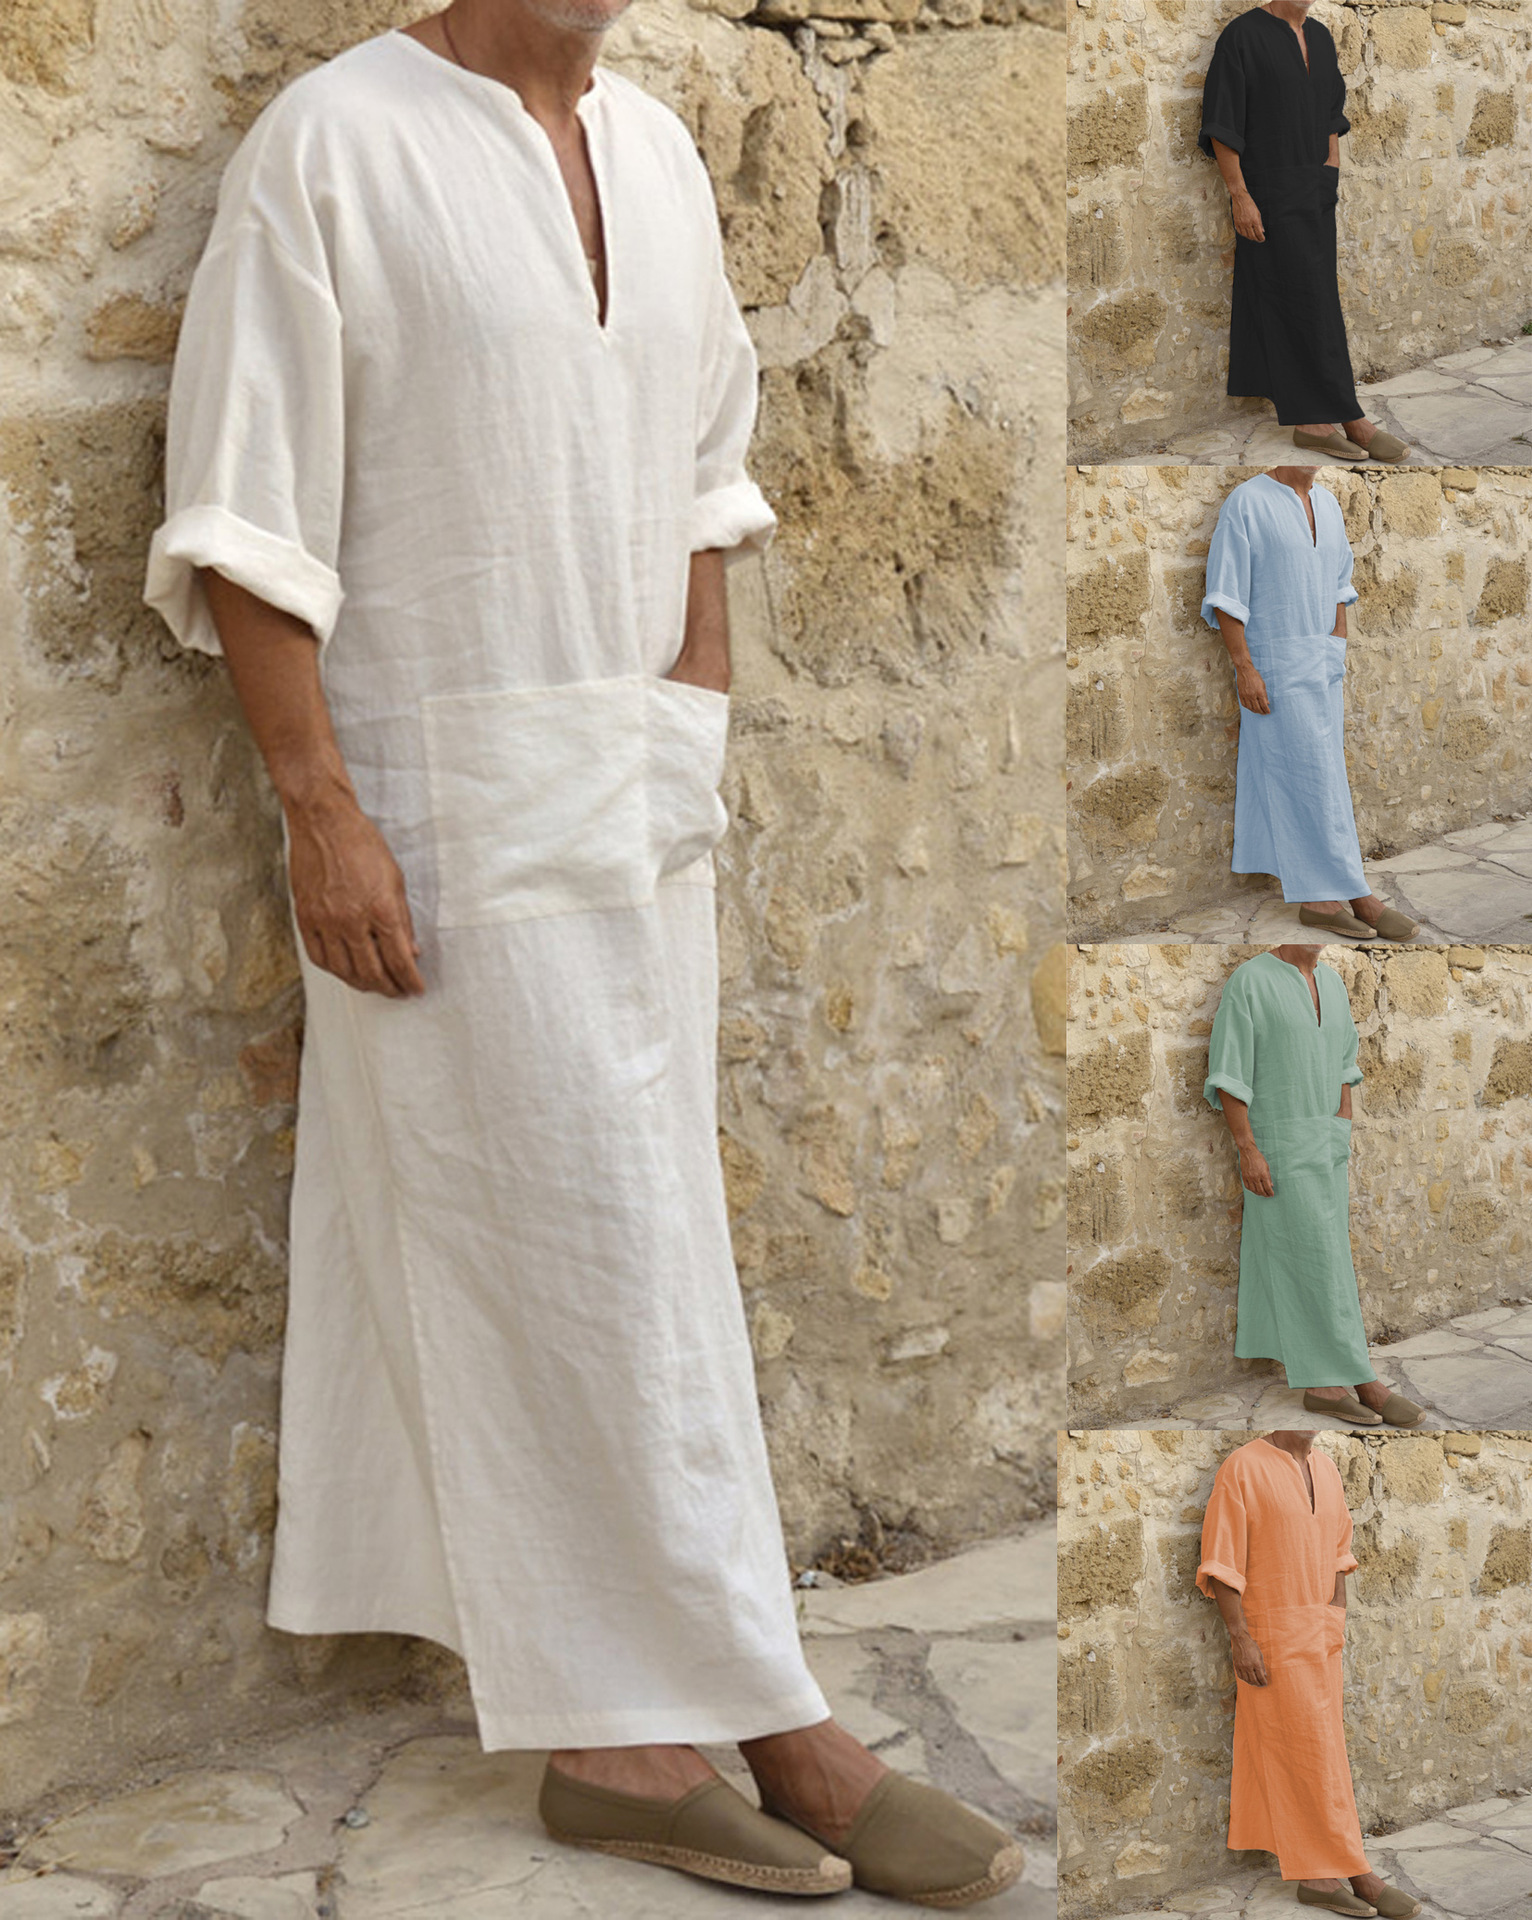 Islamic Traditional Jubba Thobe Men Abaya Linen Muslim Robes Dubai Arabic Kaftan Clothing Qamis Homme Arab Turk Gown Hijab Dress